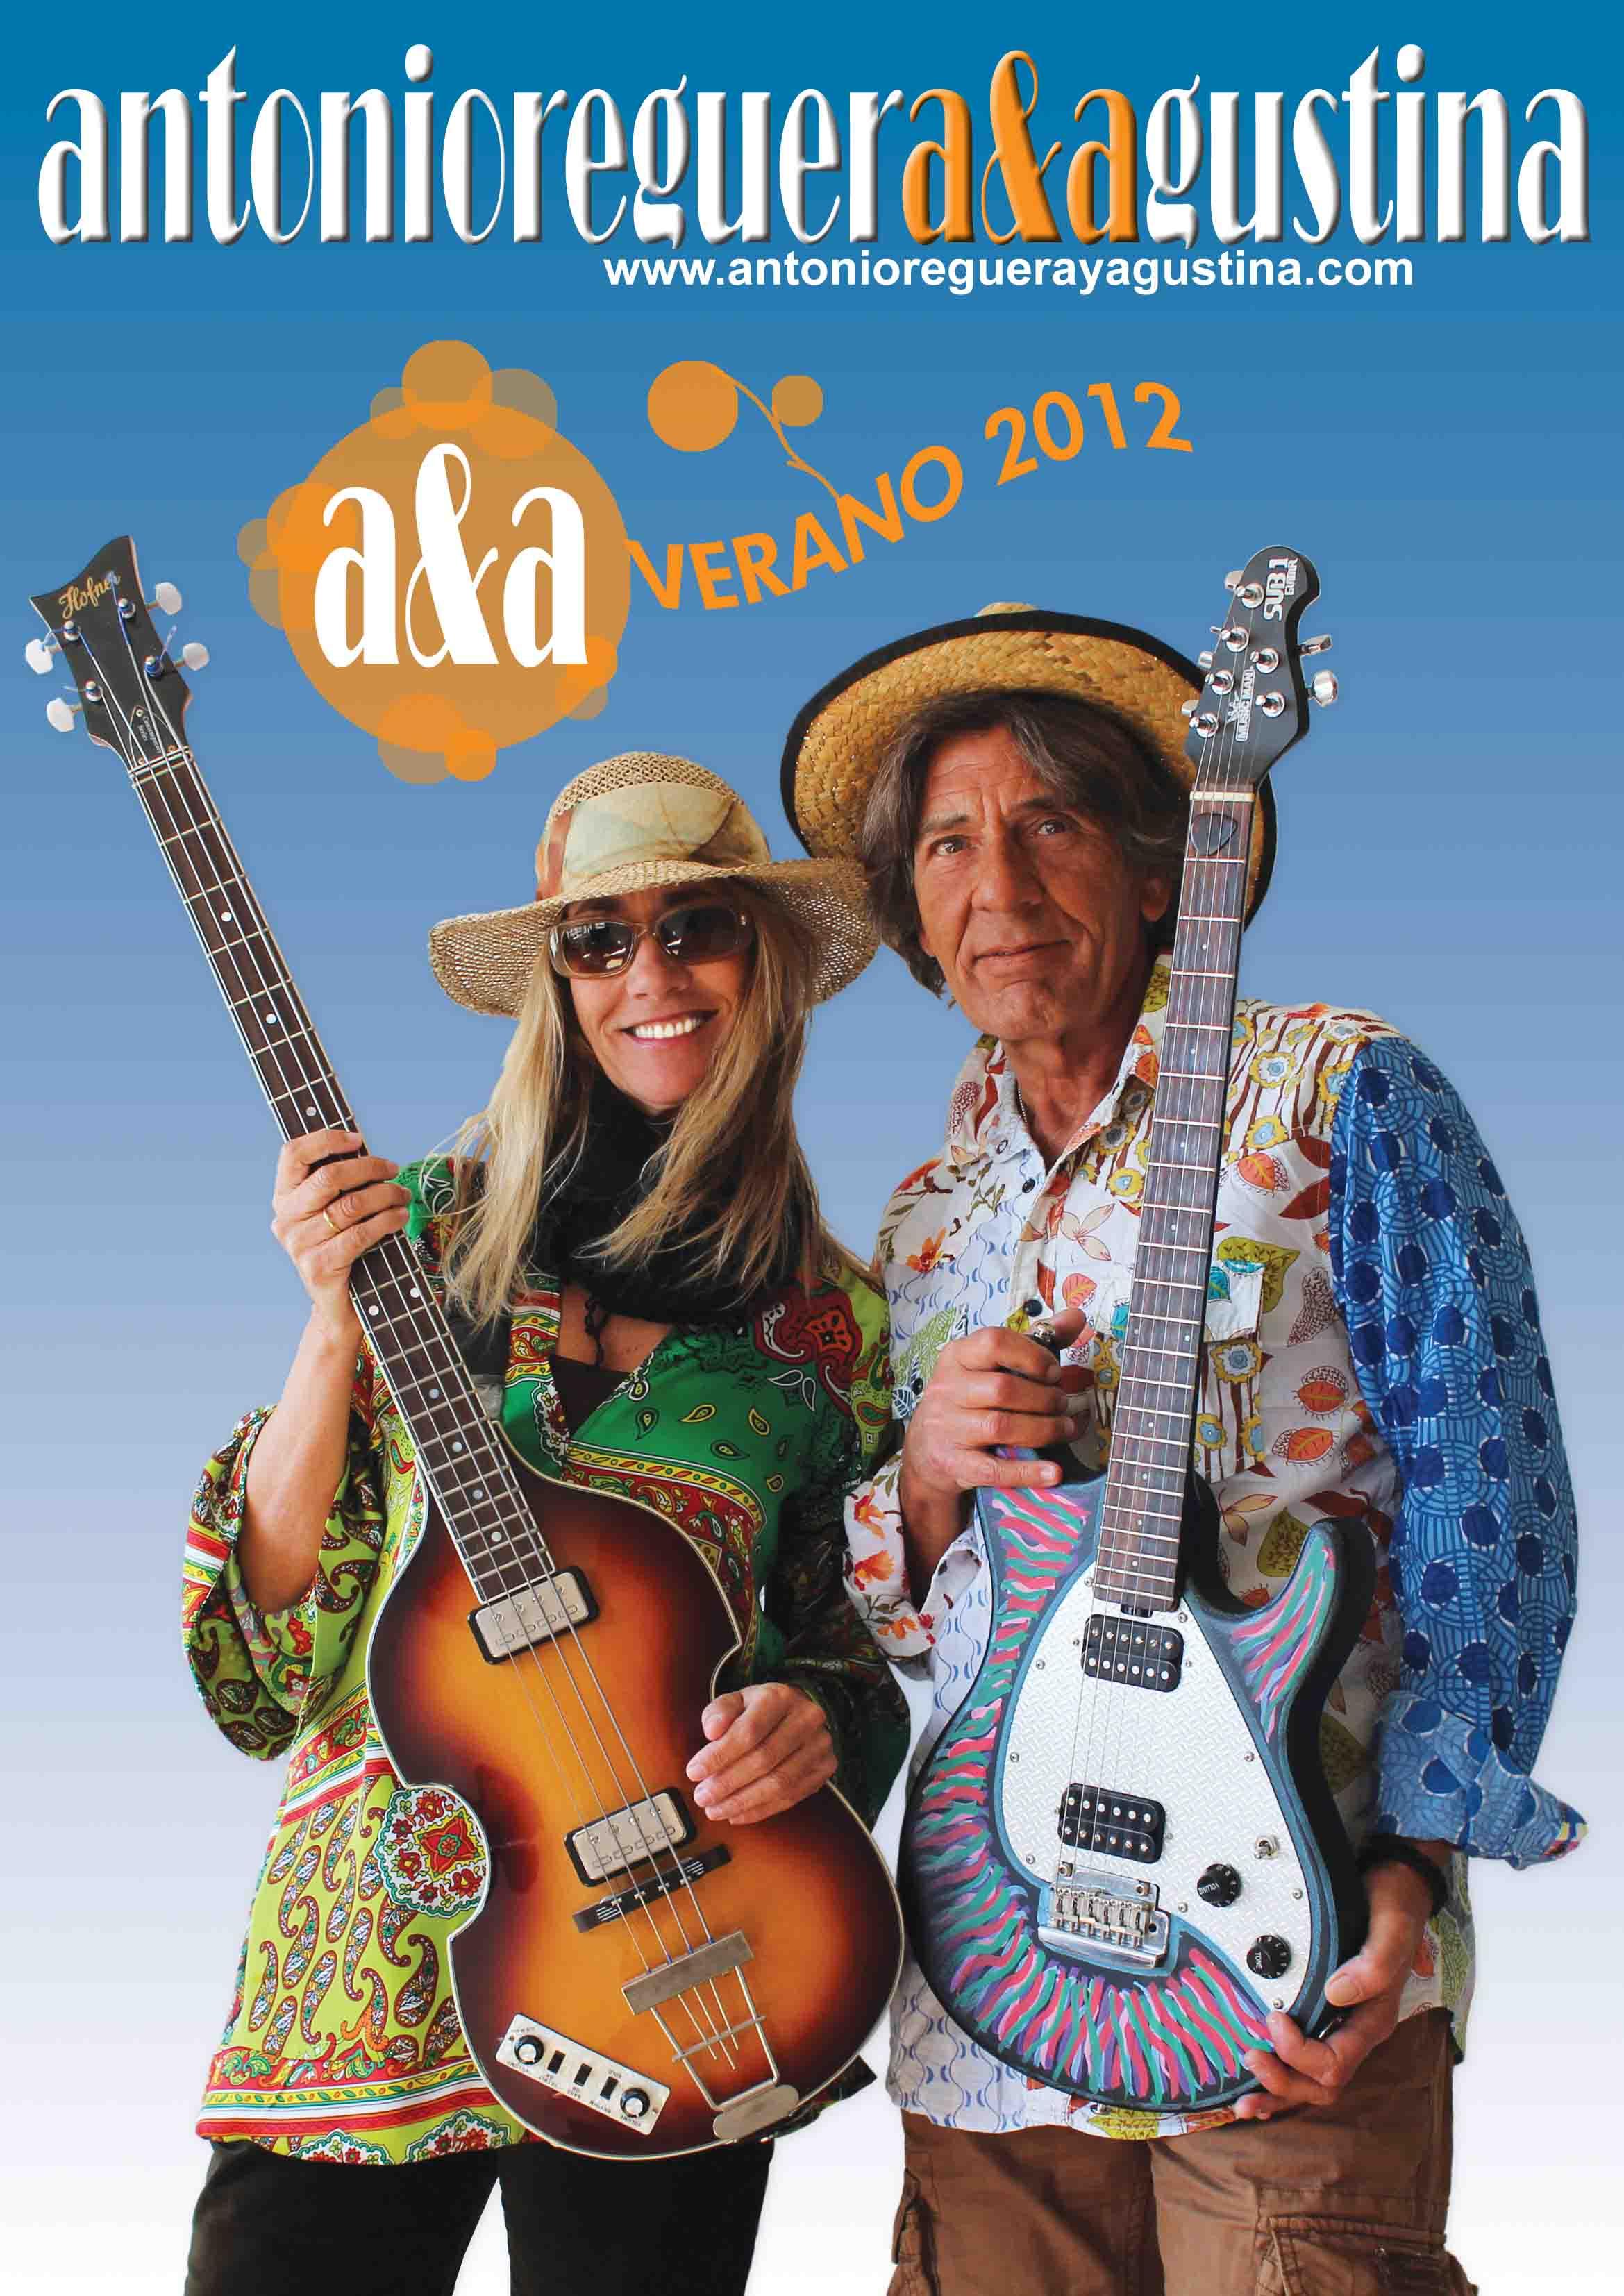 antonioreguerayagustina - Primavera 2012 - web - General verano1.jpg